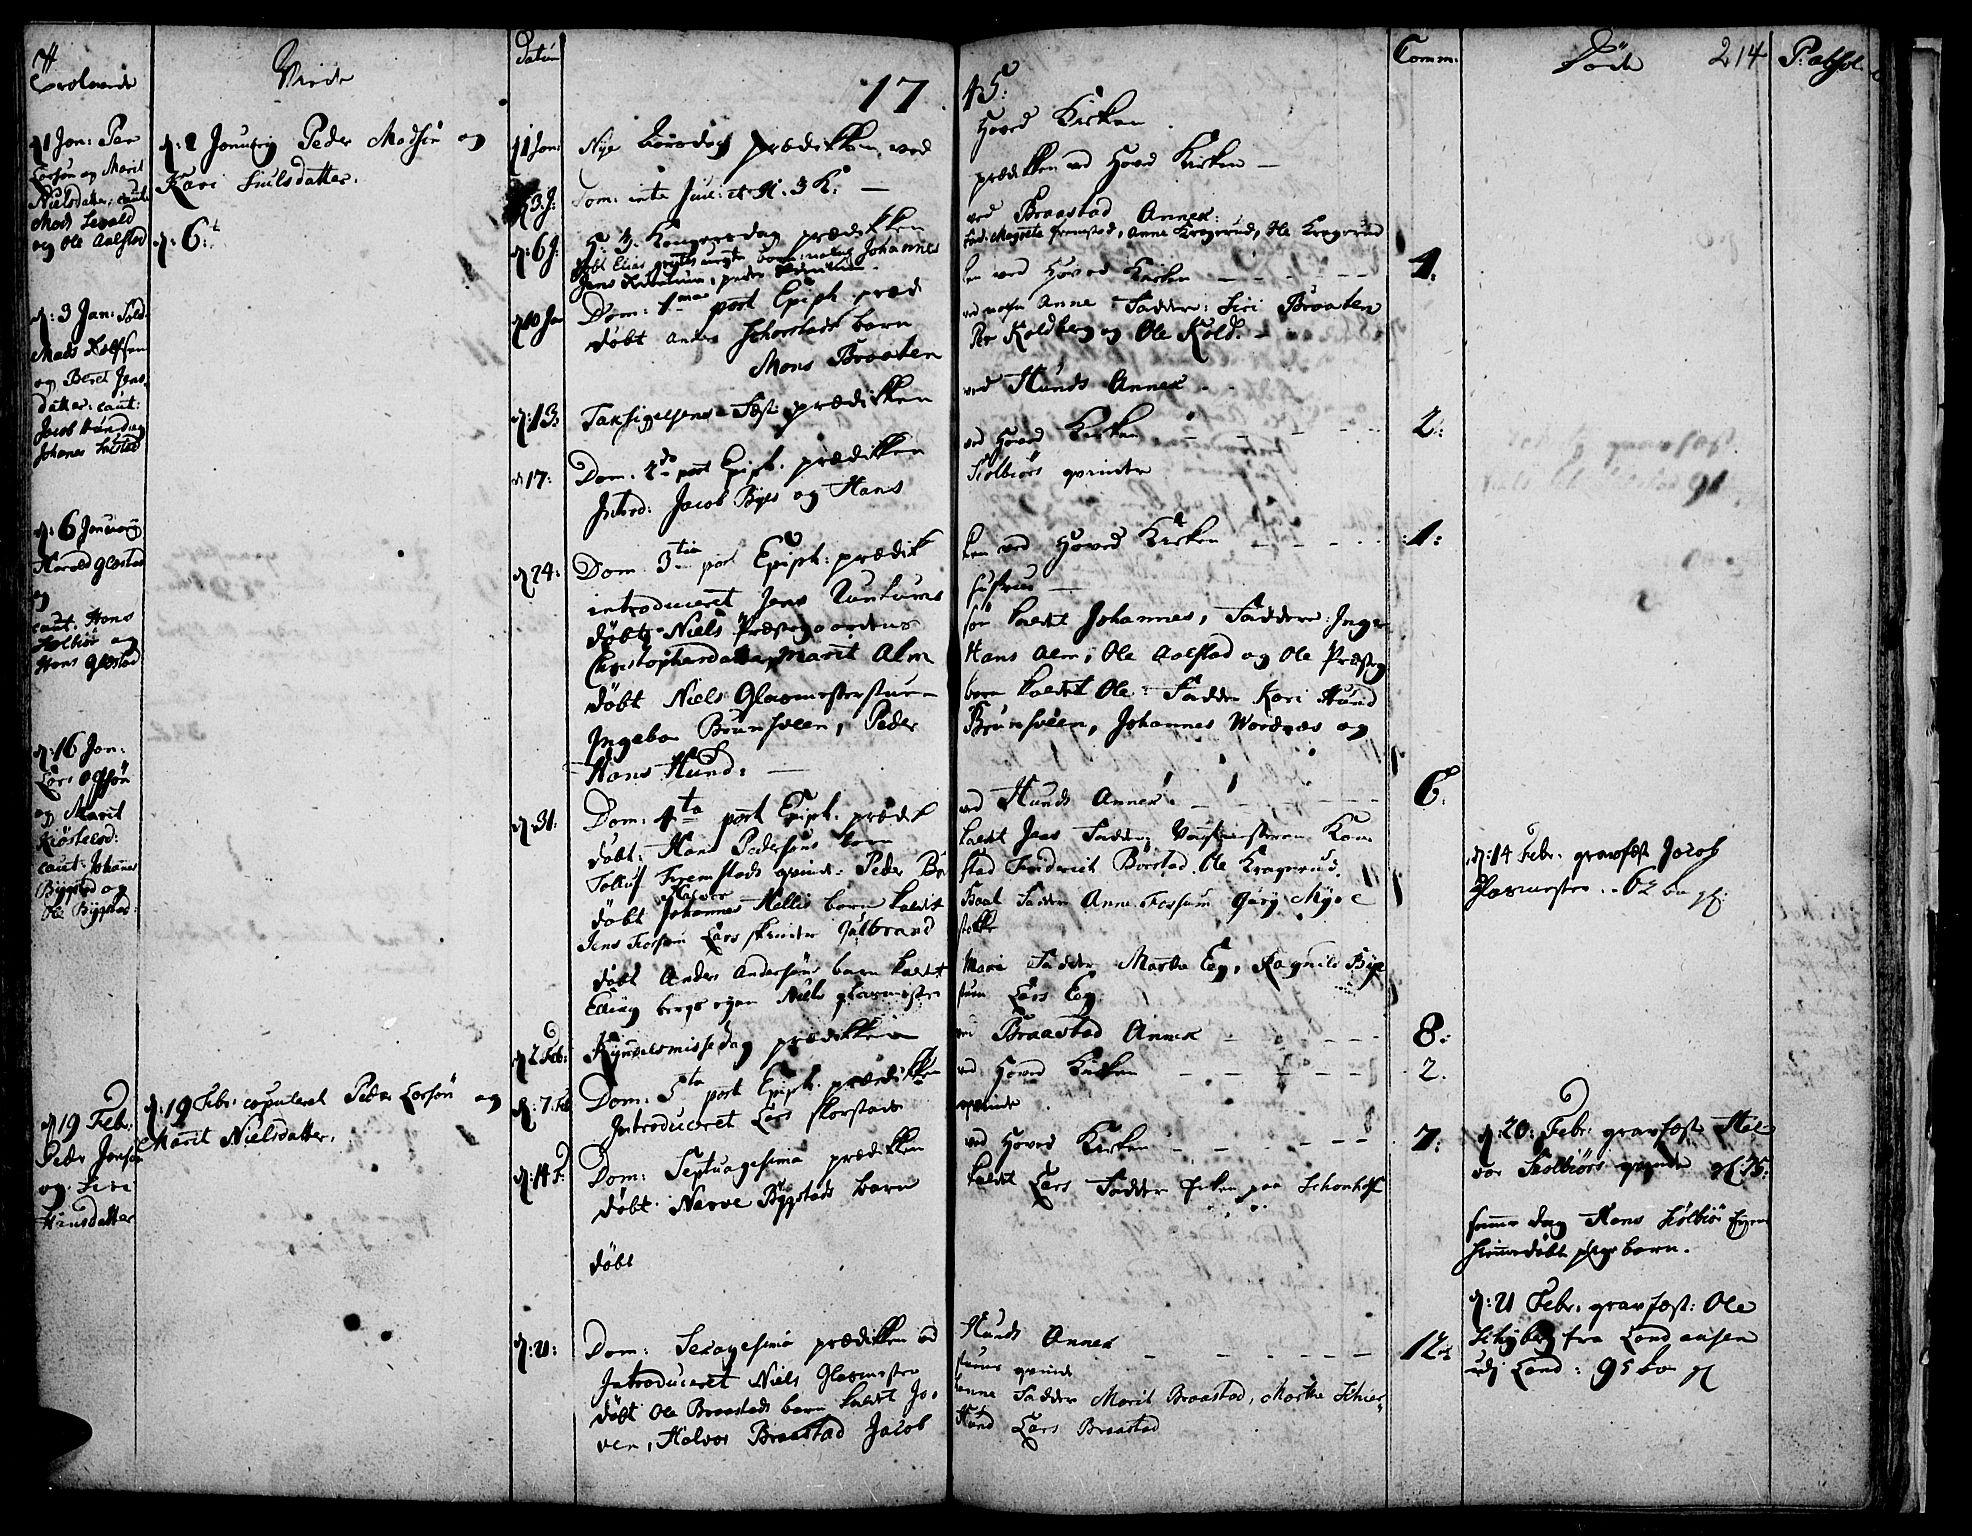 SAH, Vardal prestekontor, H/Ha/Haa/L0001: Ministerialbok nr. 1, 1706-1748, s. 214